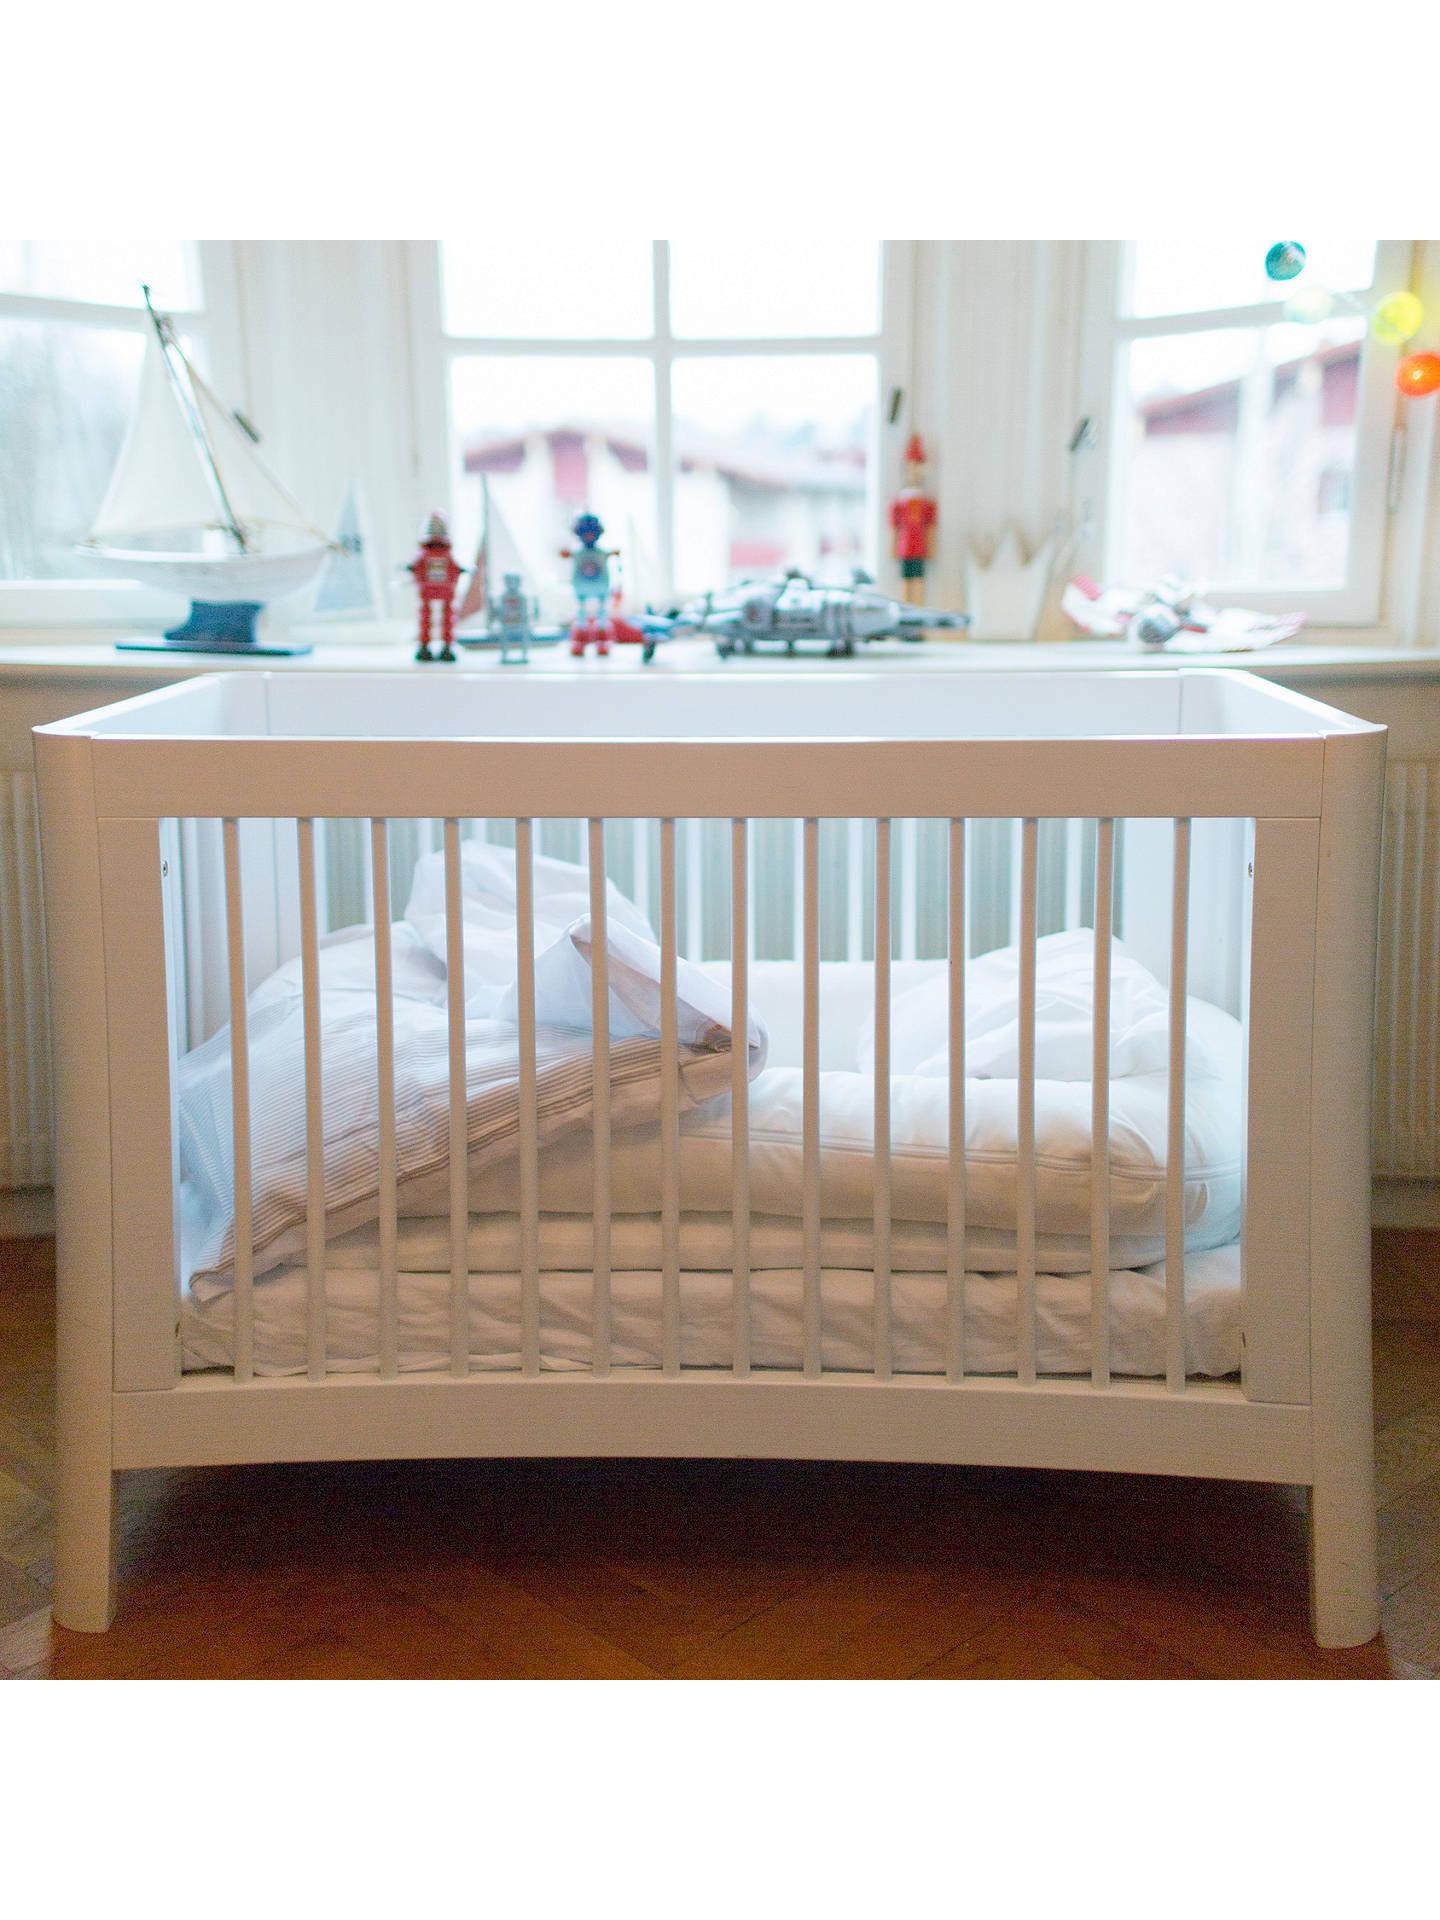 Sleepyhead Grand Pristine White Baby Pod 9 36 months at John Lewis